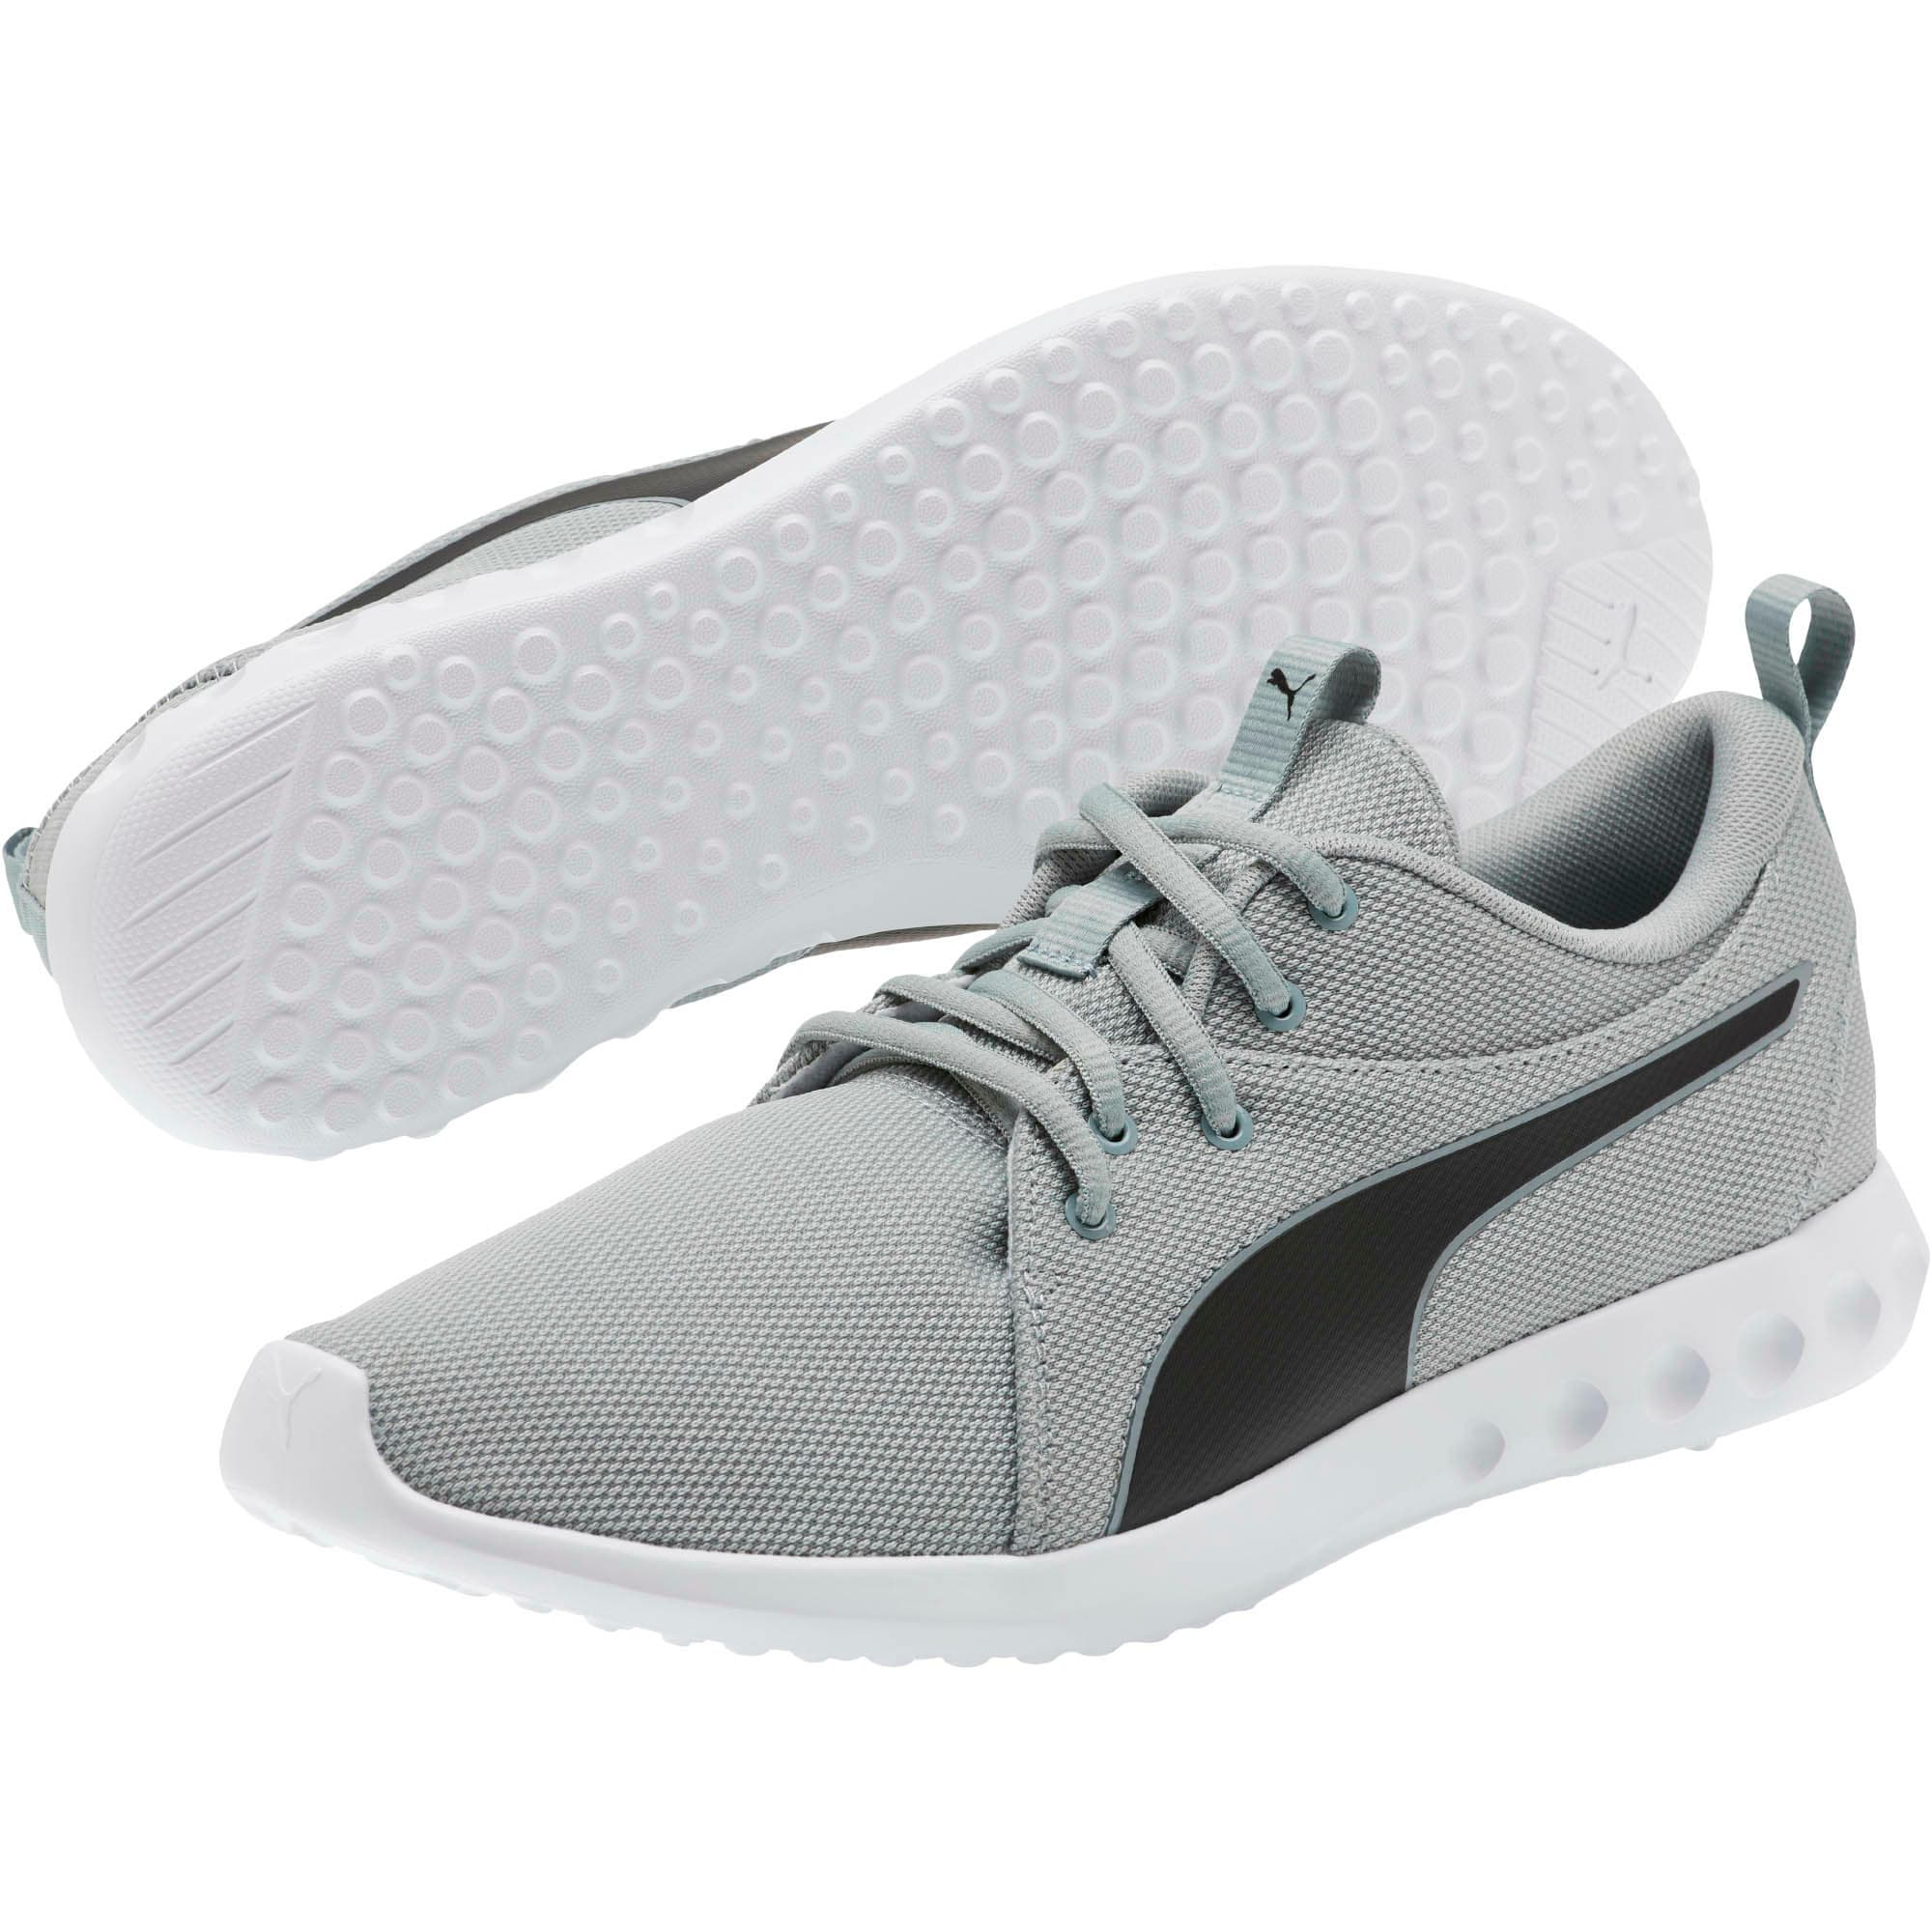 Thumbnail 2 of Carson 2 Cosmo Men's Running Shoes, Quarry-Puma Black, medium